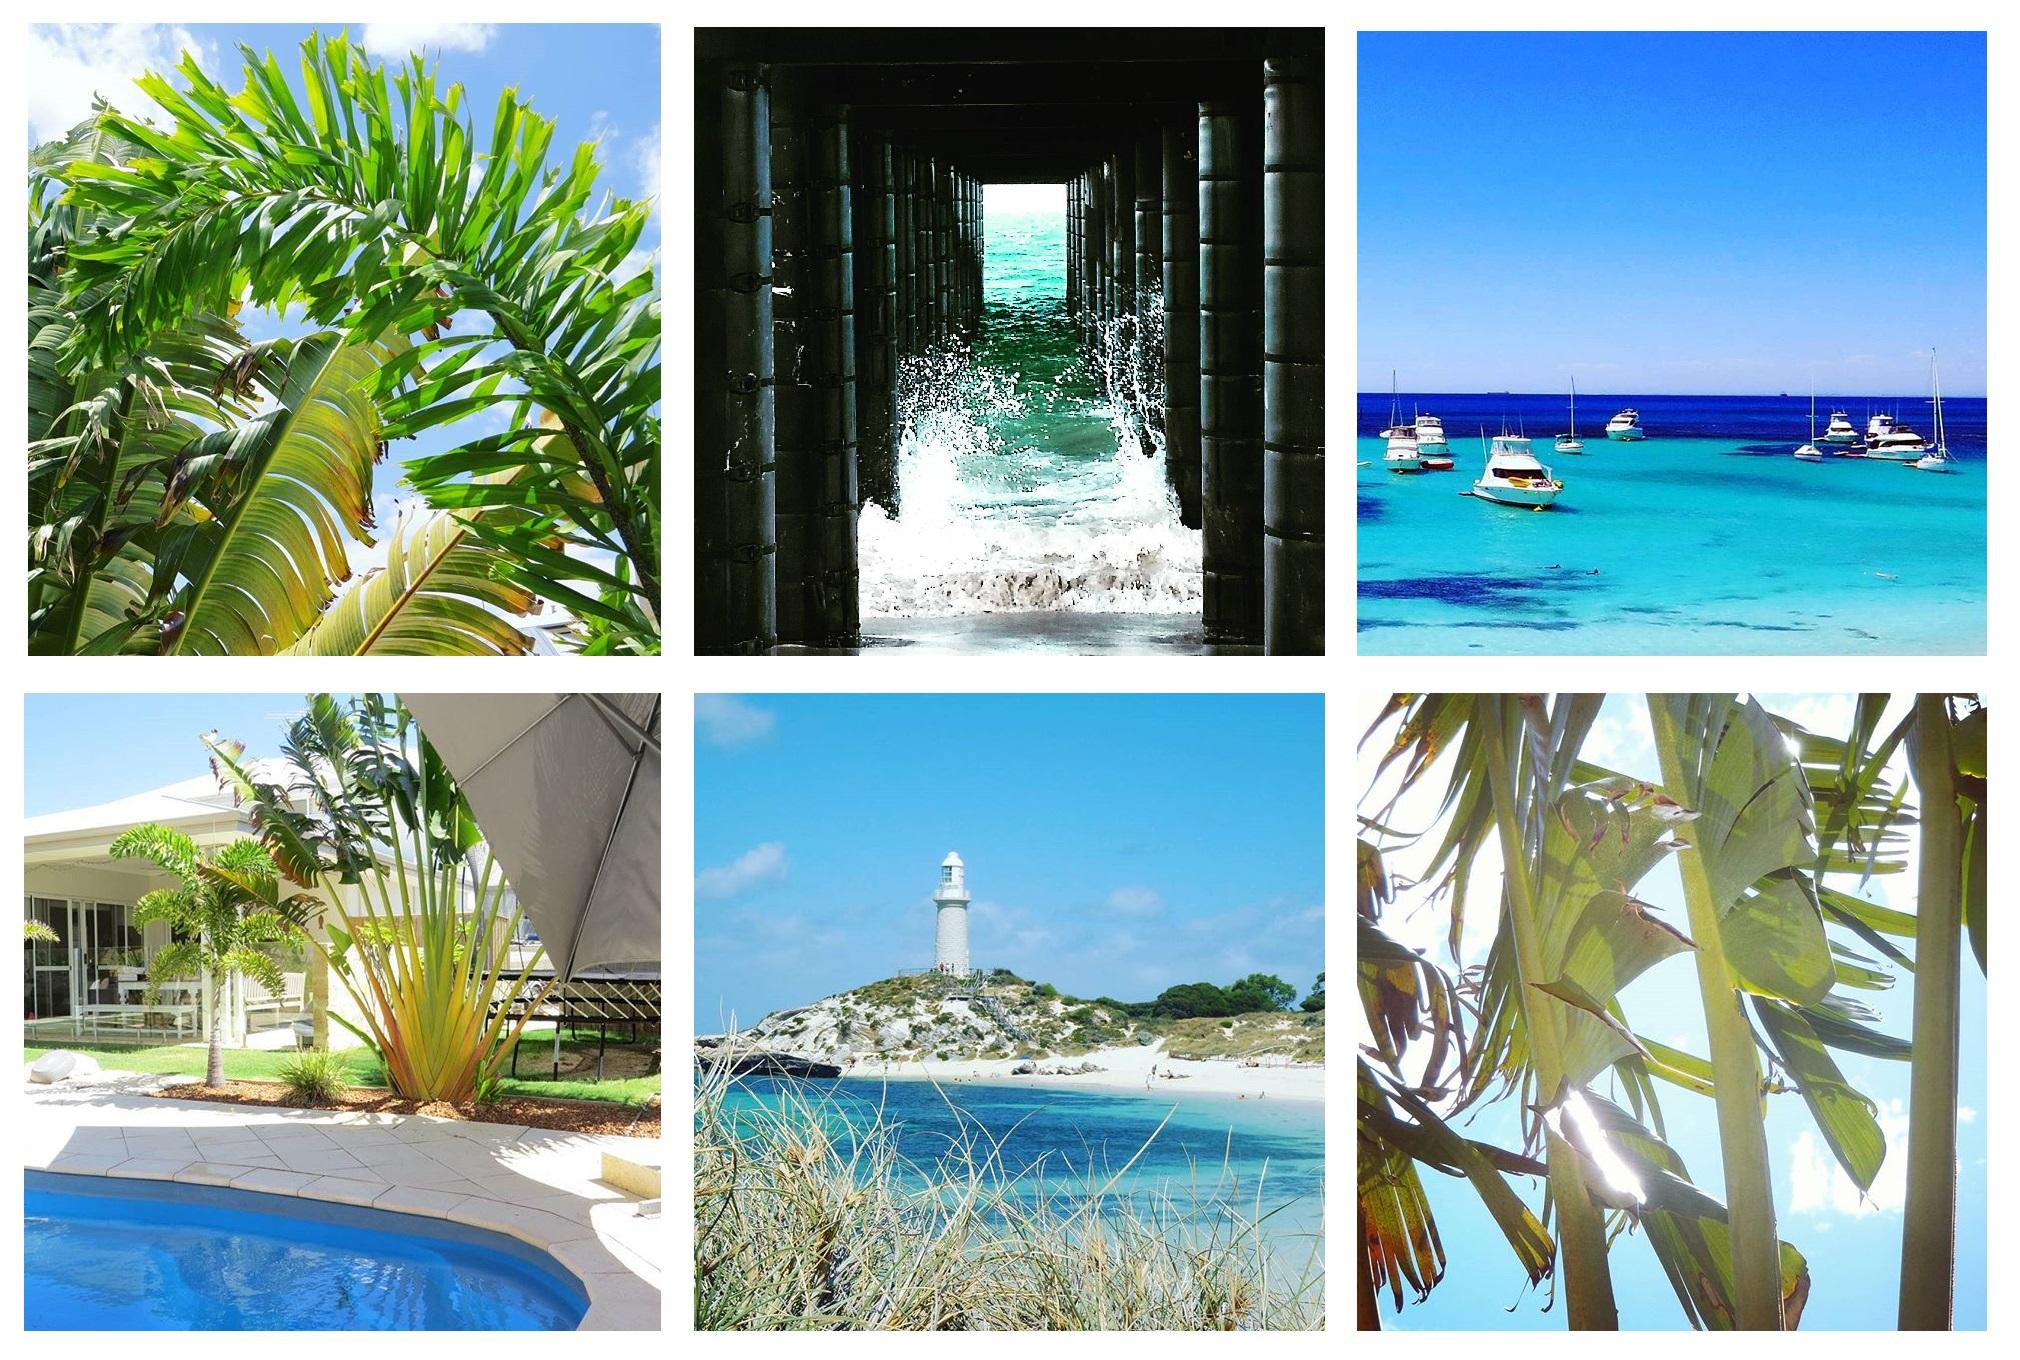 coastal style inspirations